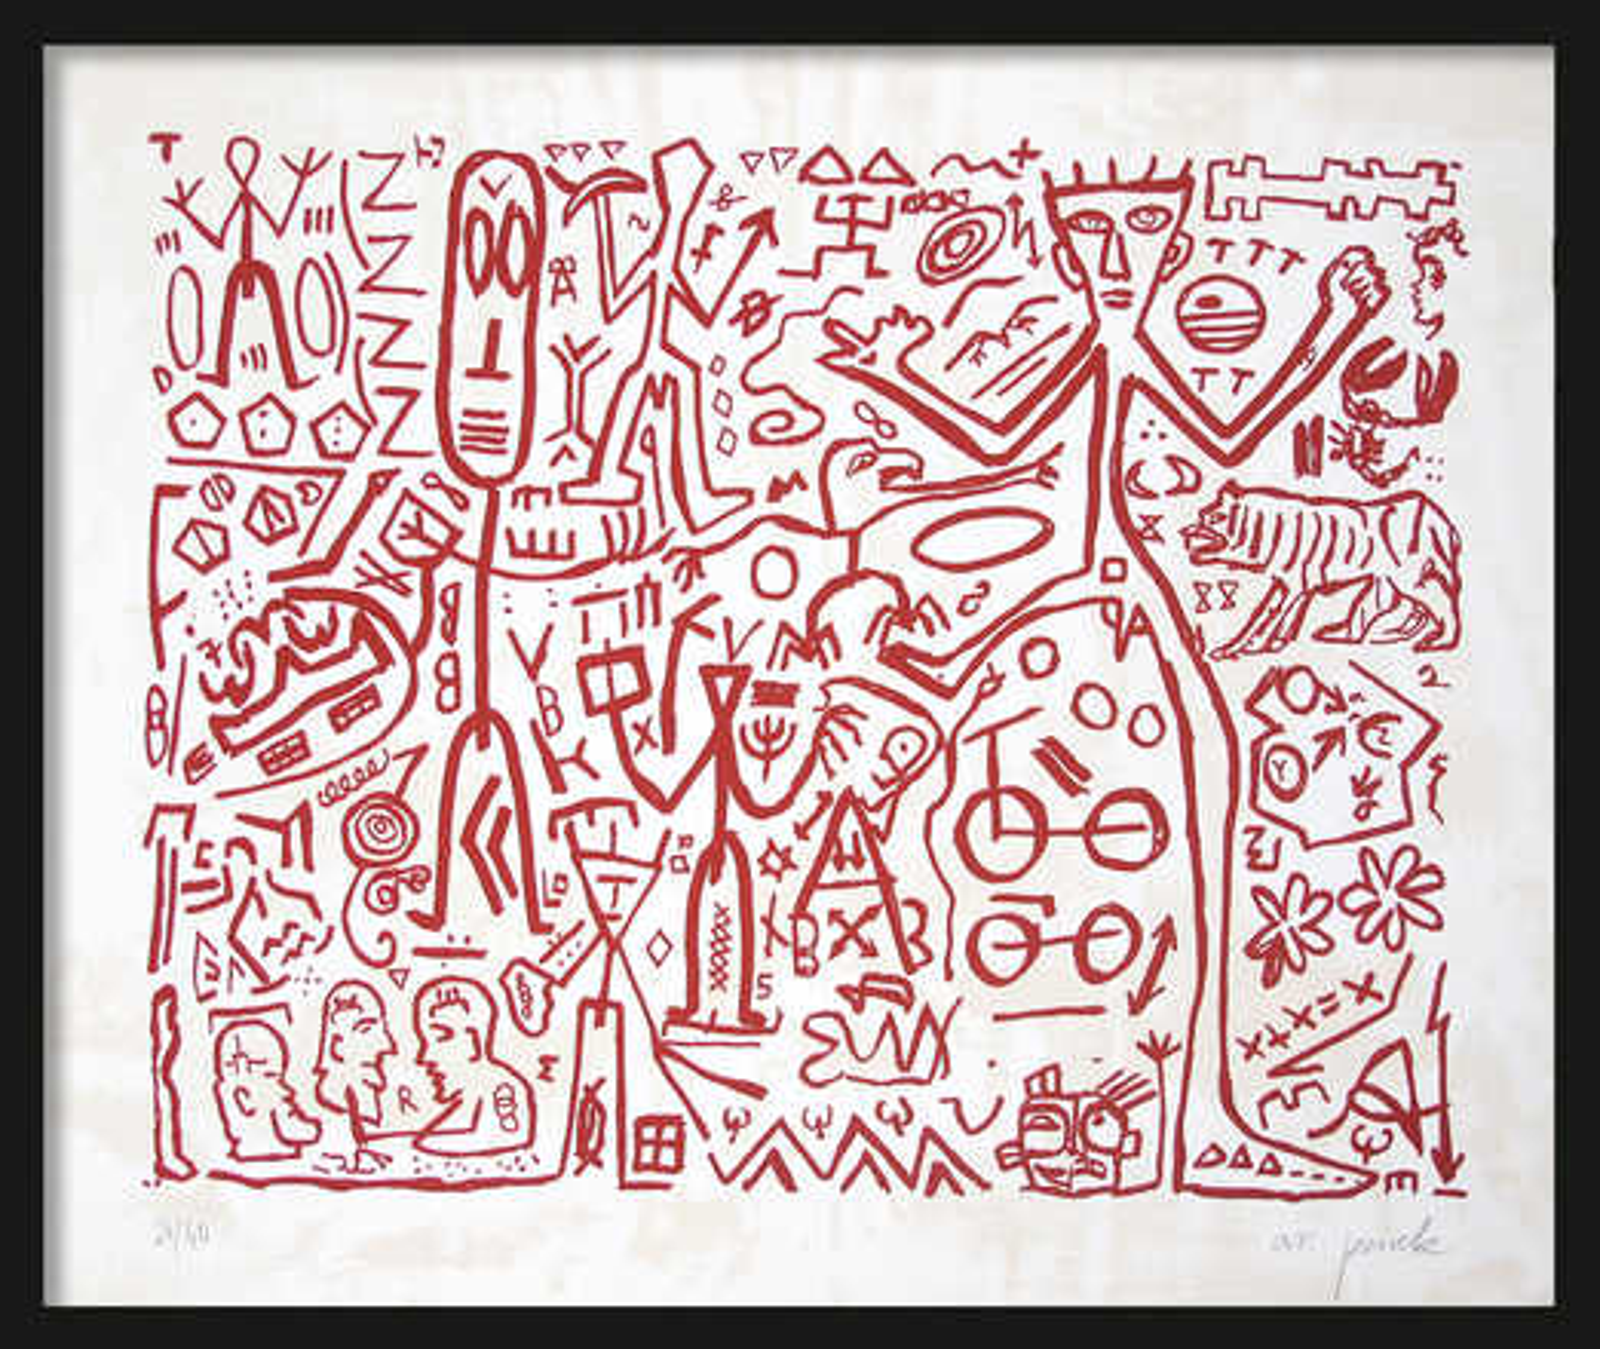 Ohne Titel (Version Rot) - A.r. Penck